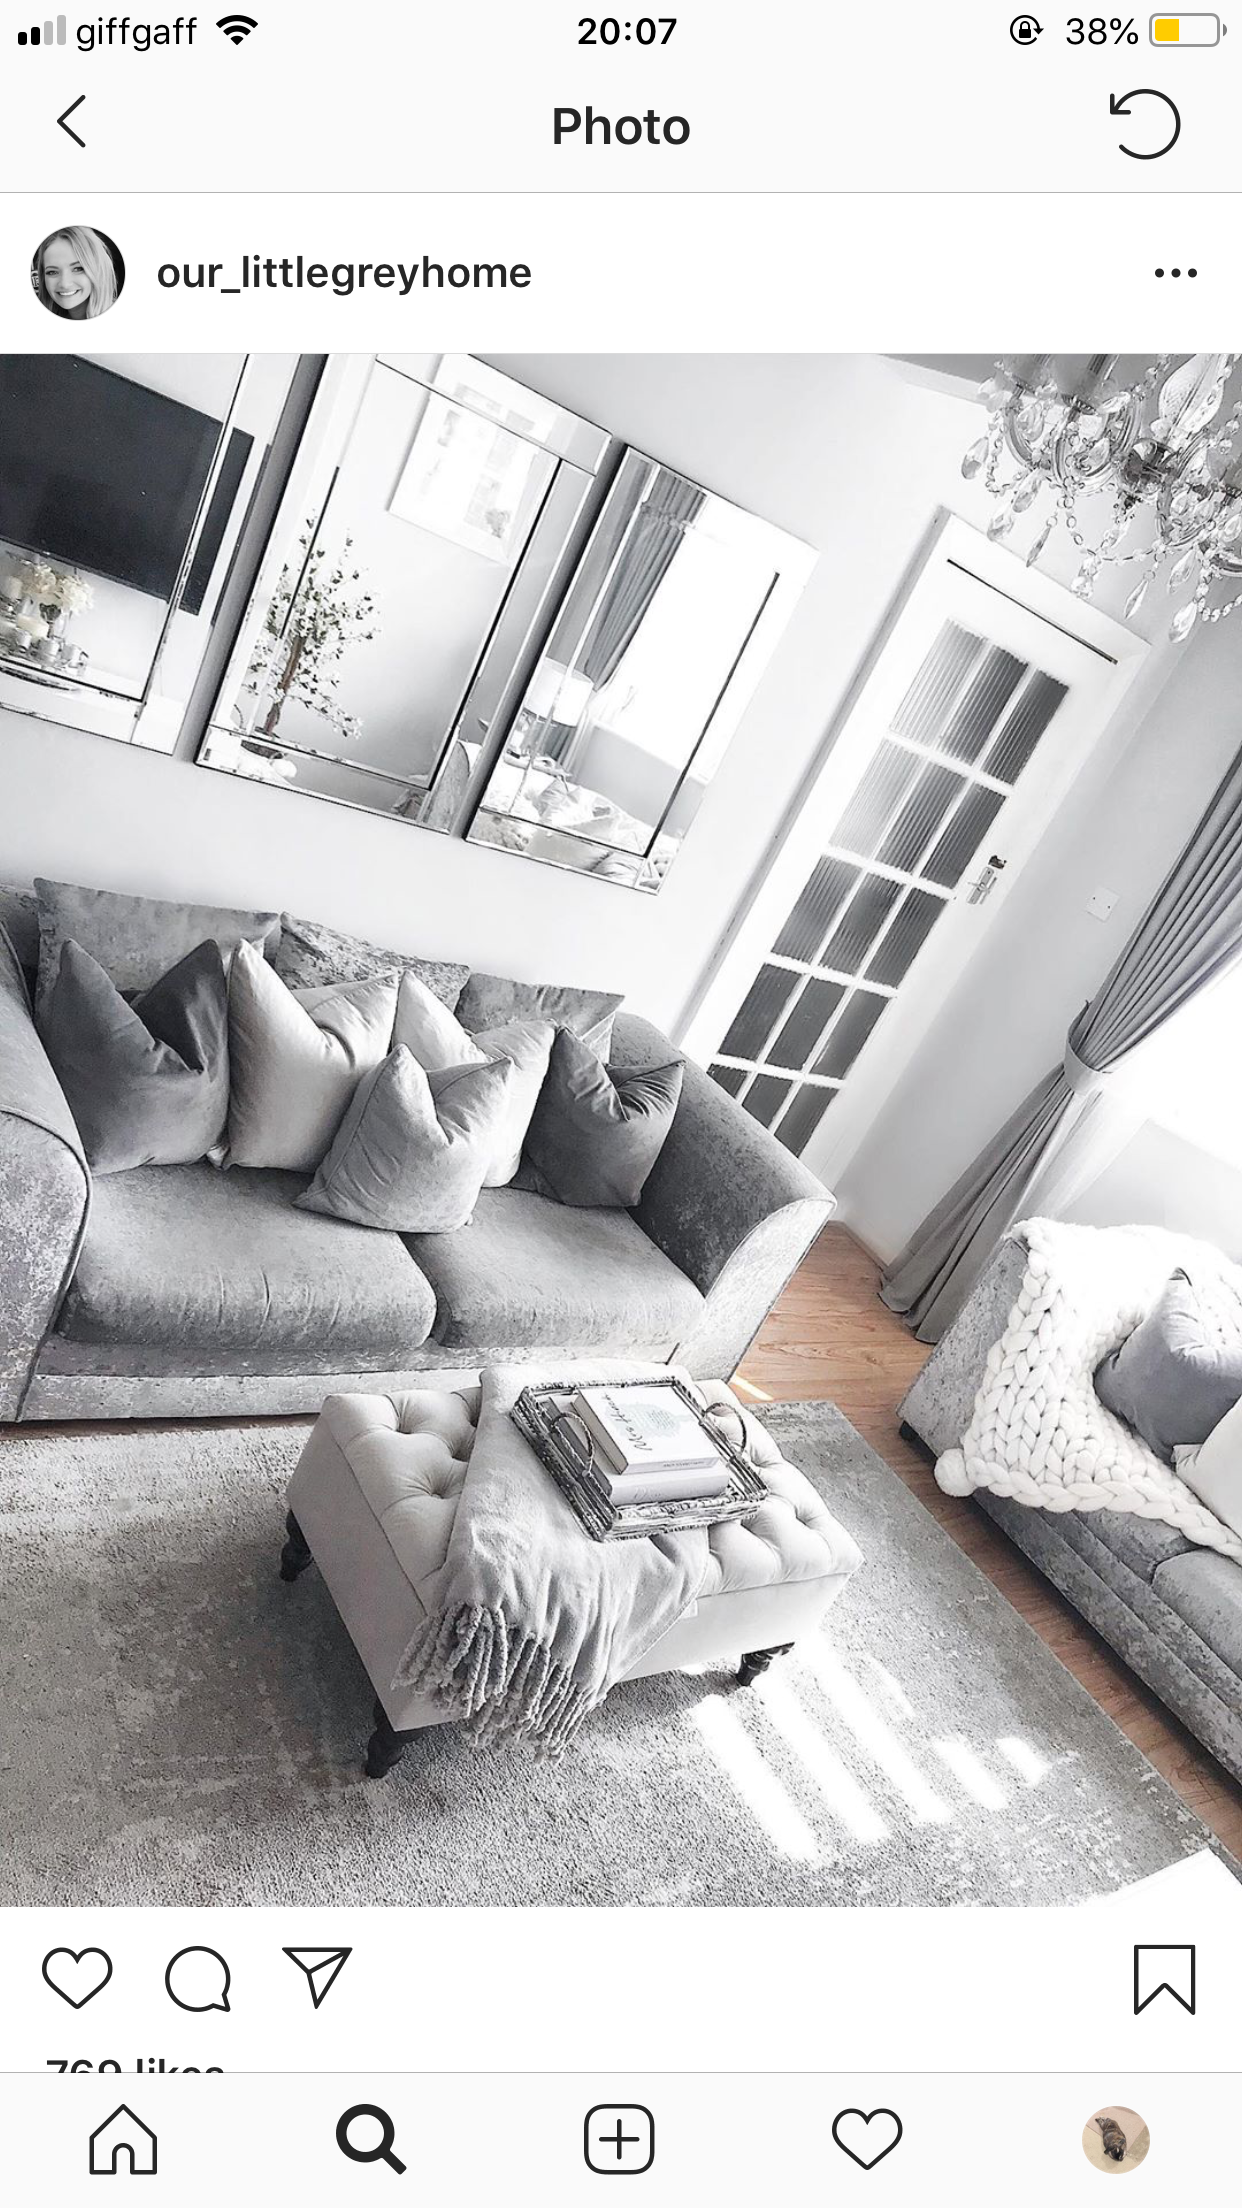 Phenomenal Instagram Door No 7 Safina Wing Back King Size Ottoman Bed Spiritservingveterans Wood Chair Design Ideas Spiritservingveteransorg